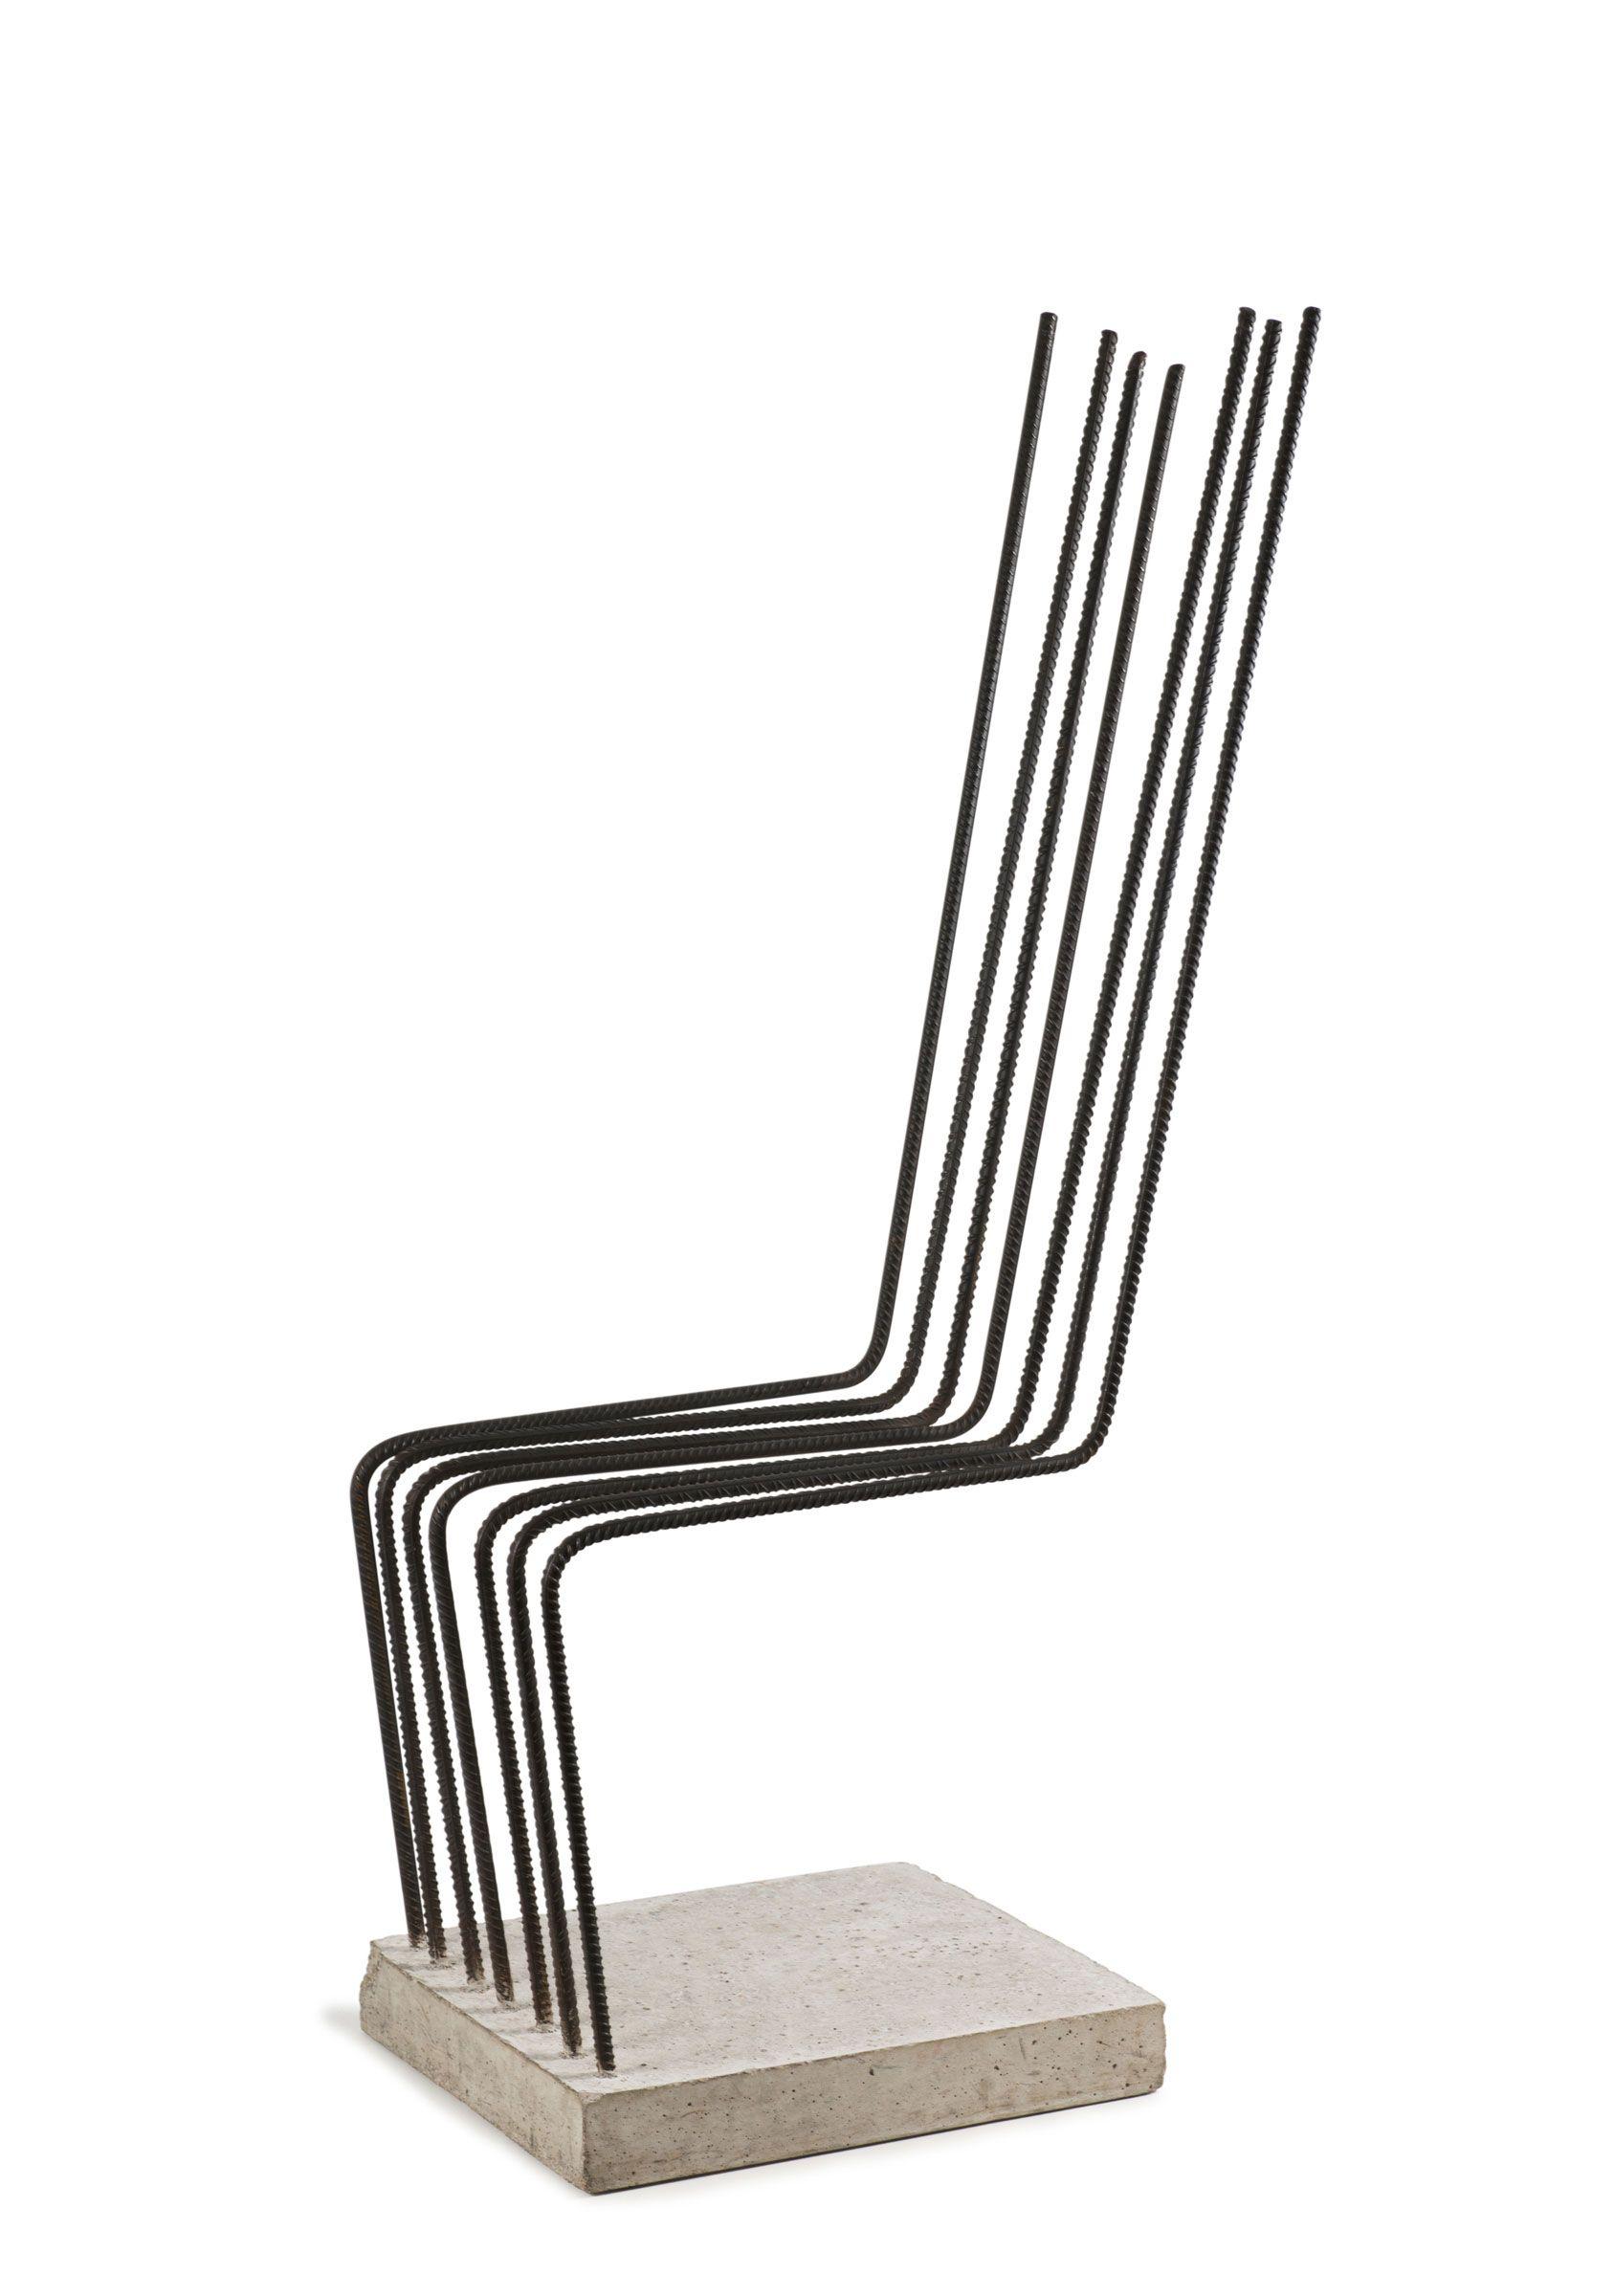 Molinari Tavoli E Sedie.Heinz H Landes Rebar And Concrete Solid Chair 1993